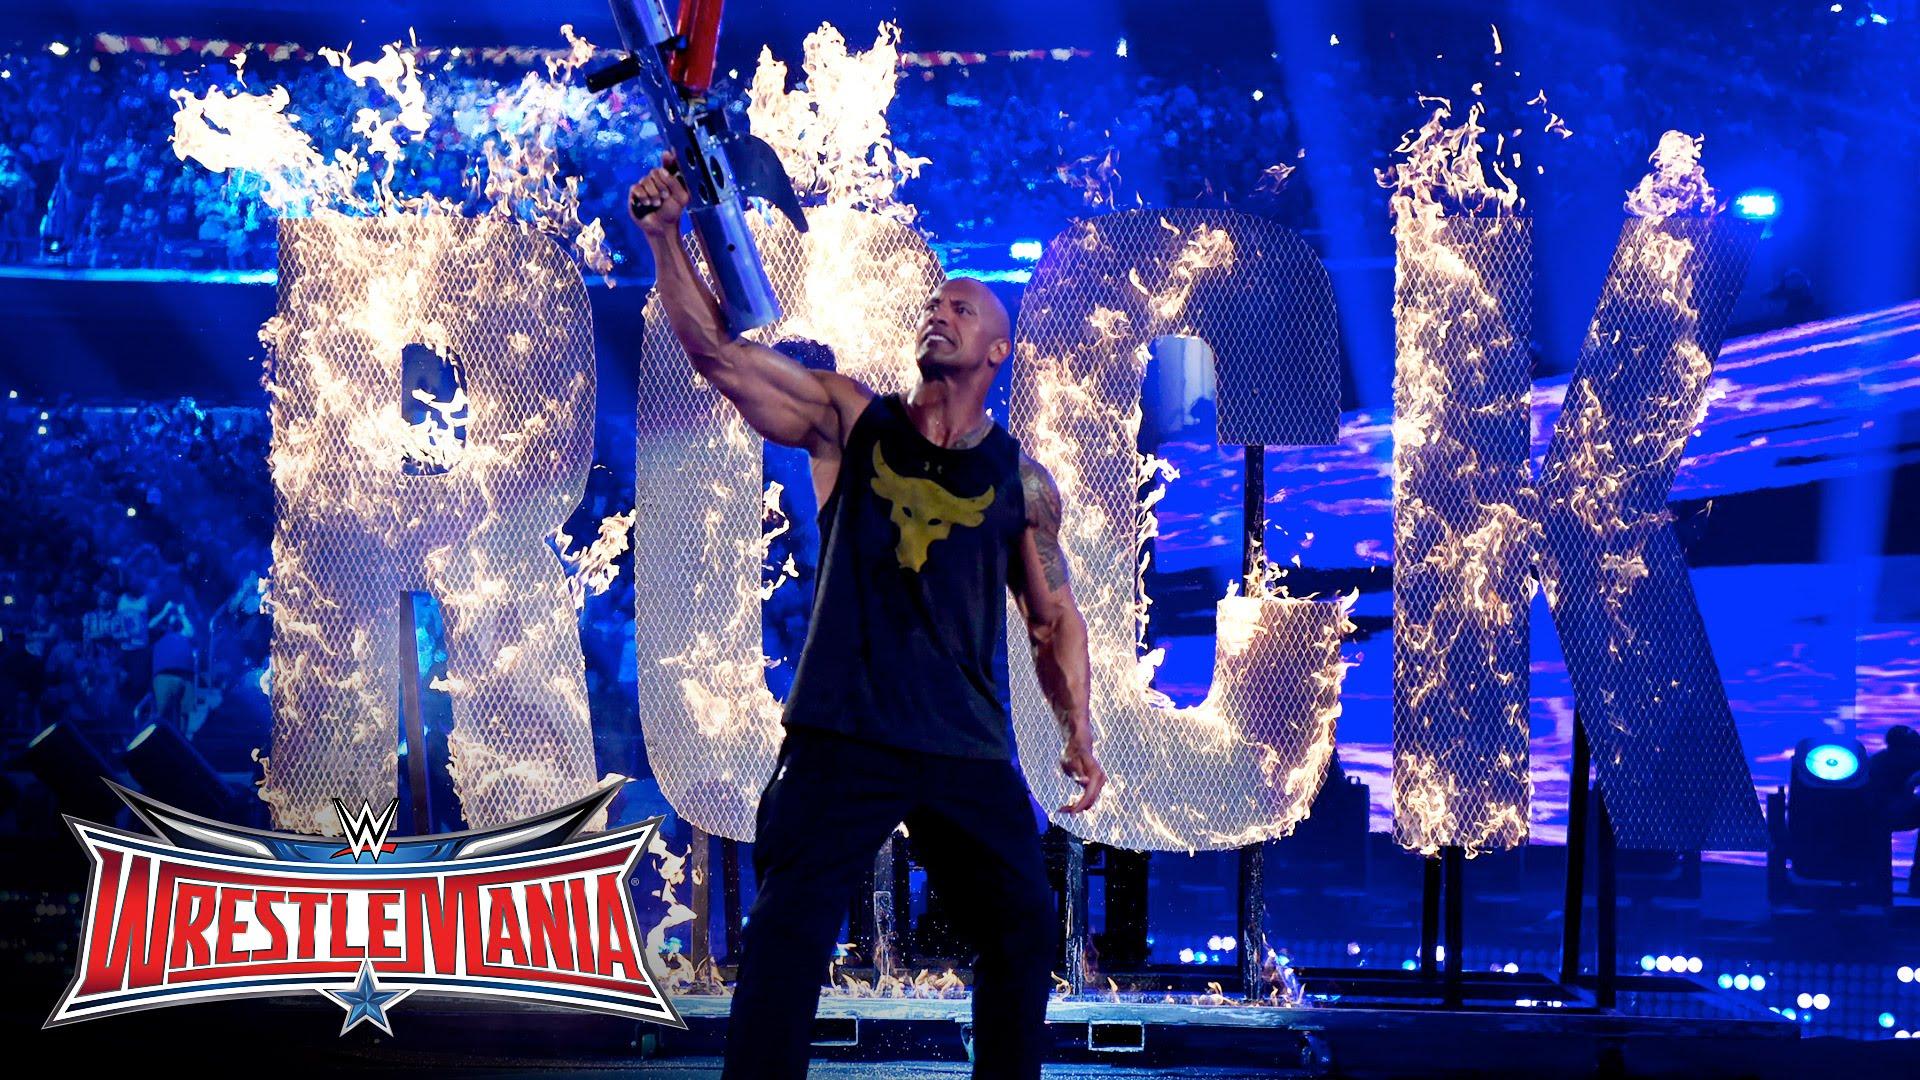 The Rock makes his return at Wrestle Mania 32 in Dallas